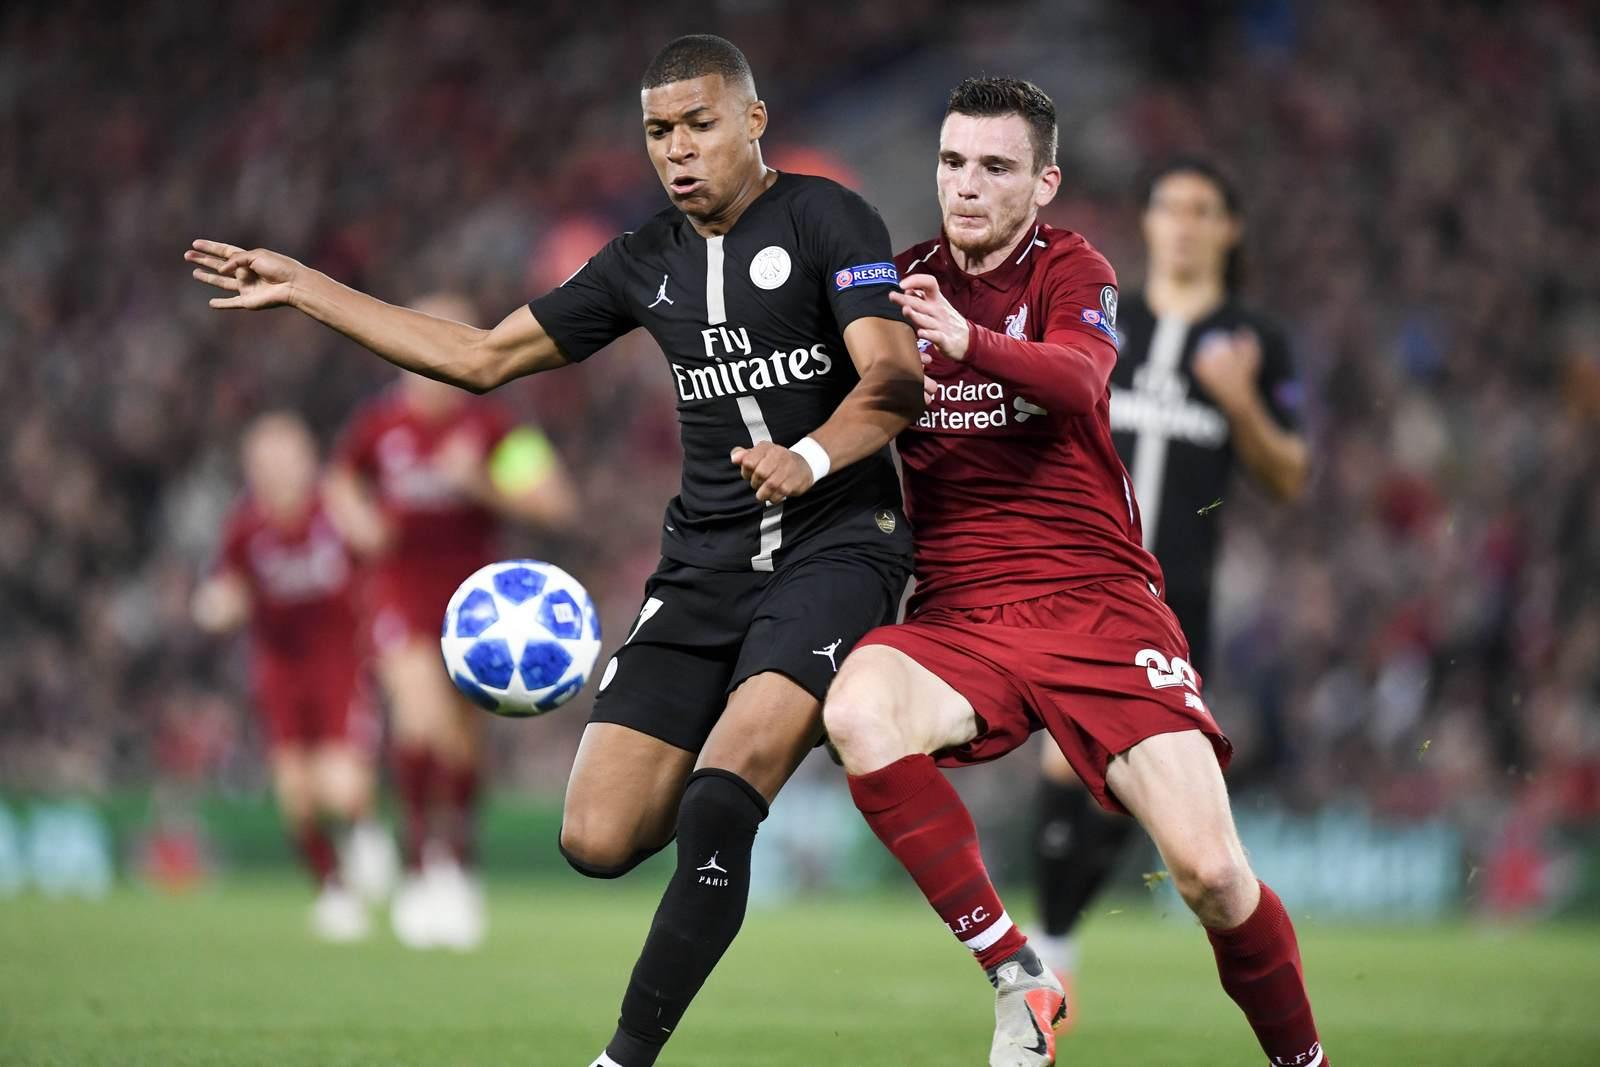 Kylian Mbappé gegen Andrew Robertson. Jetzt auf PSG vs Liverpool wetten